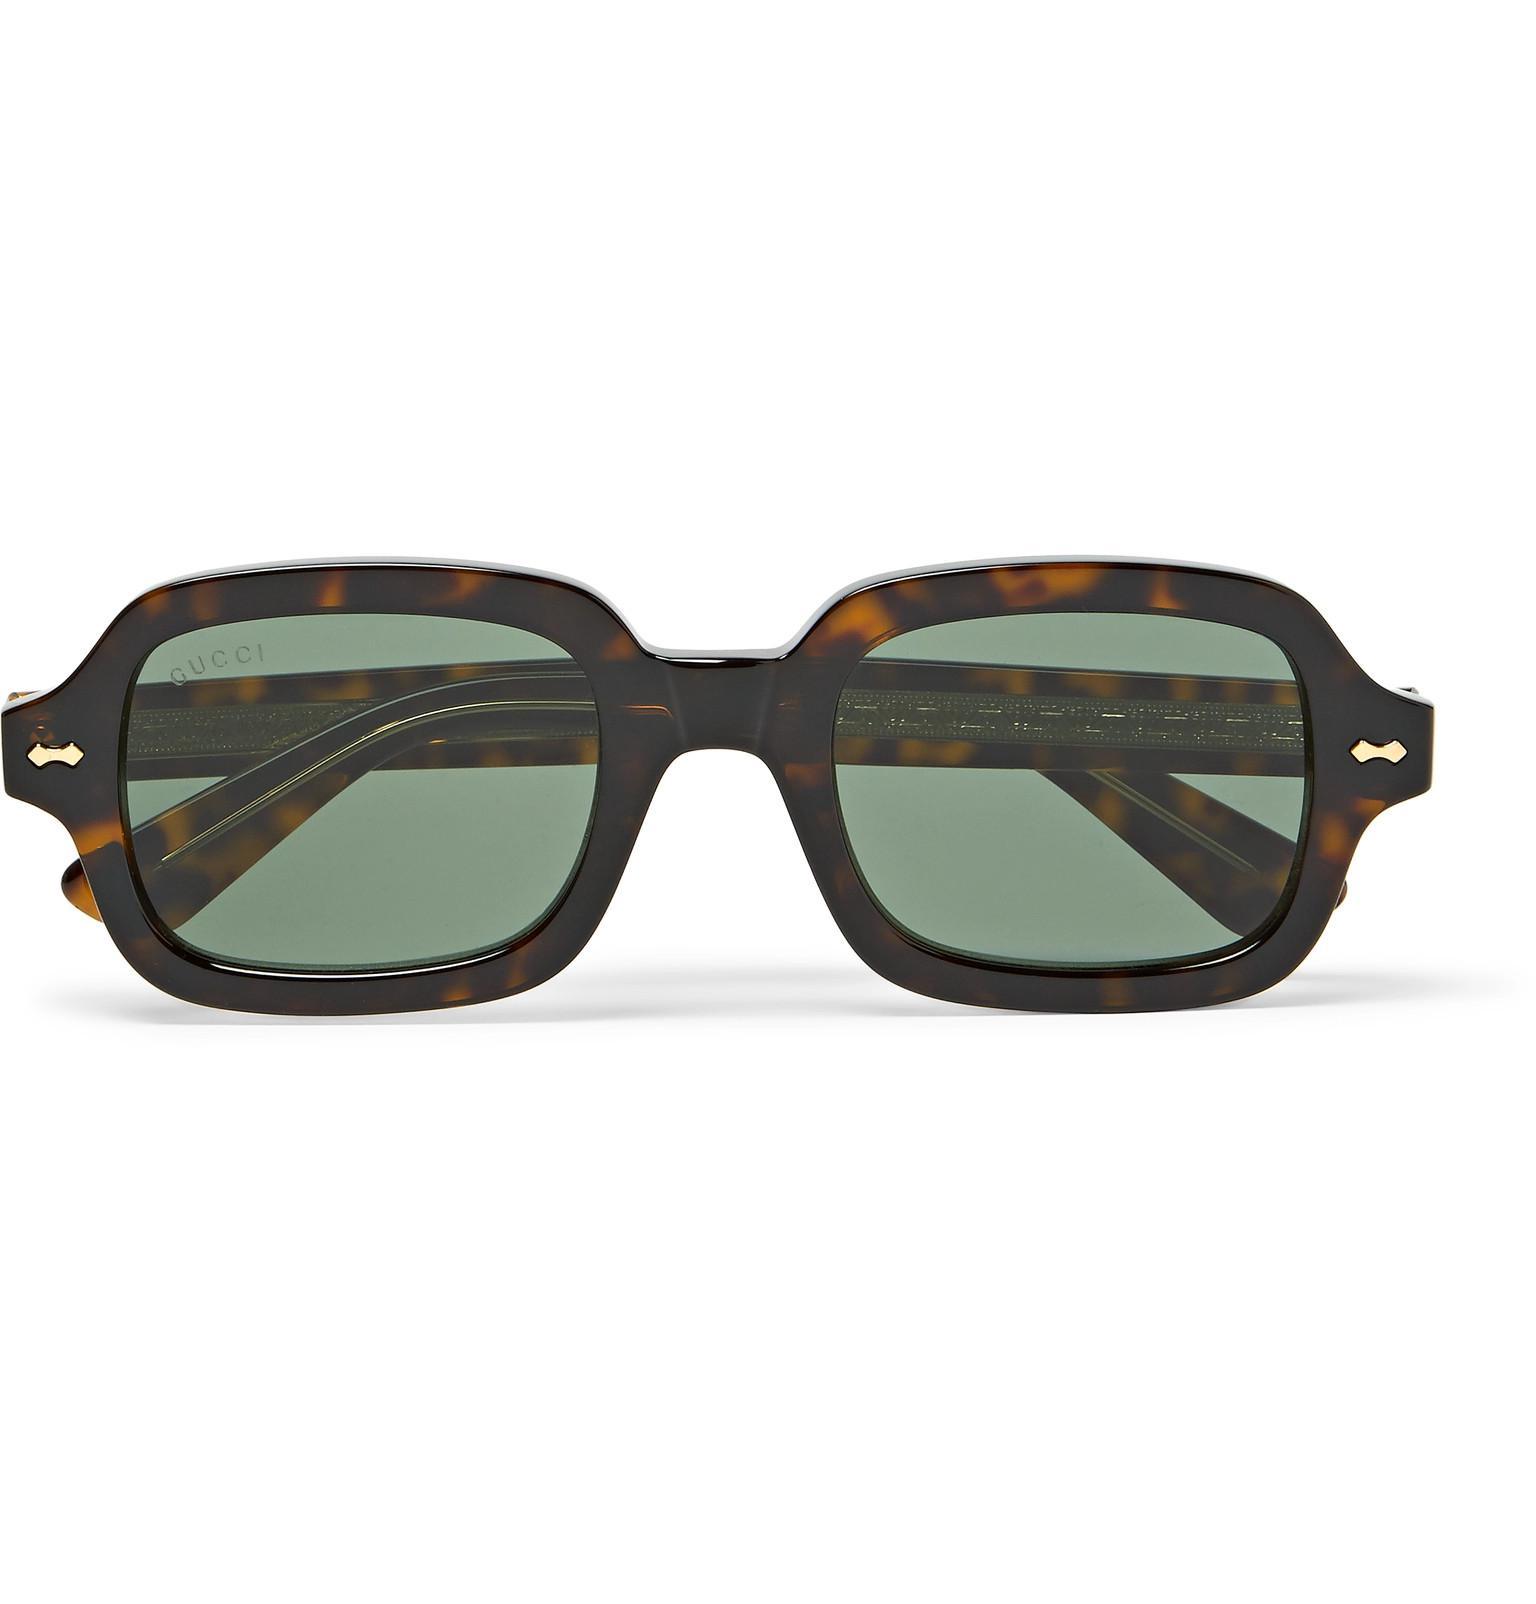 0be8ceb2b56 Gucci Square-frame Tortoiseshell Acetate Sunglasses in Brown for Men ...